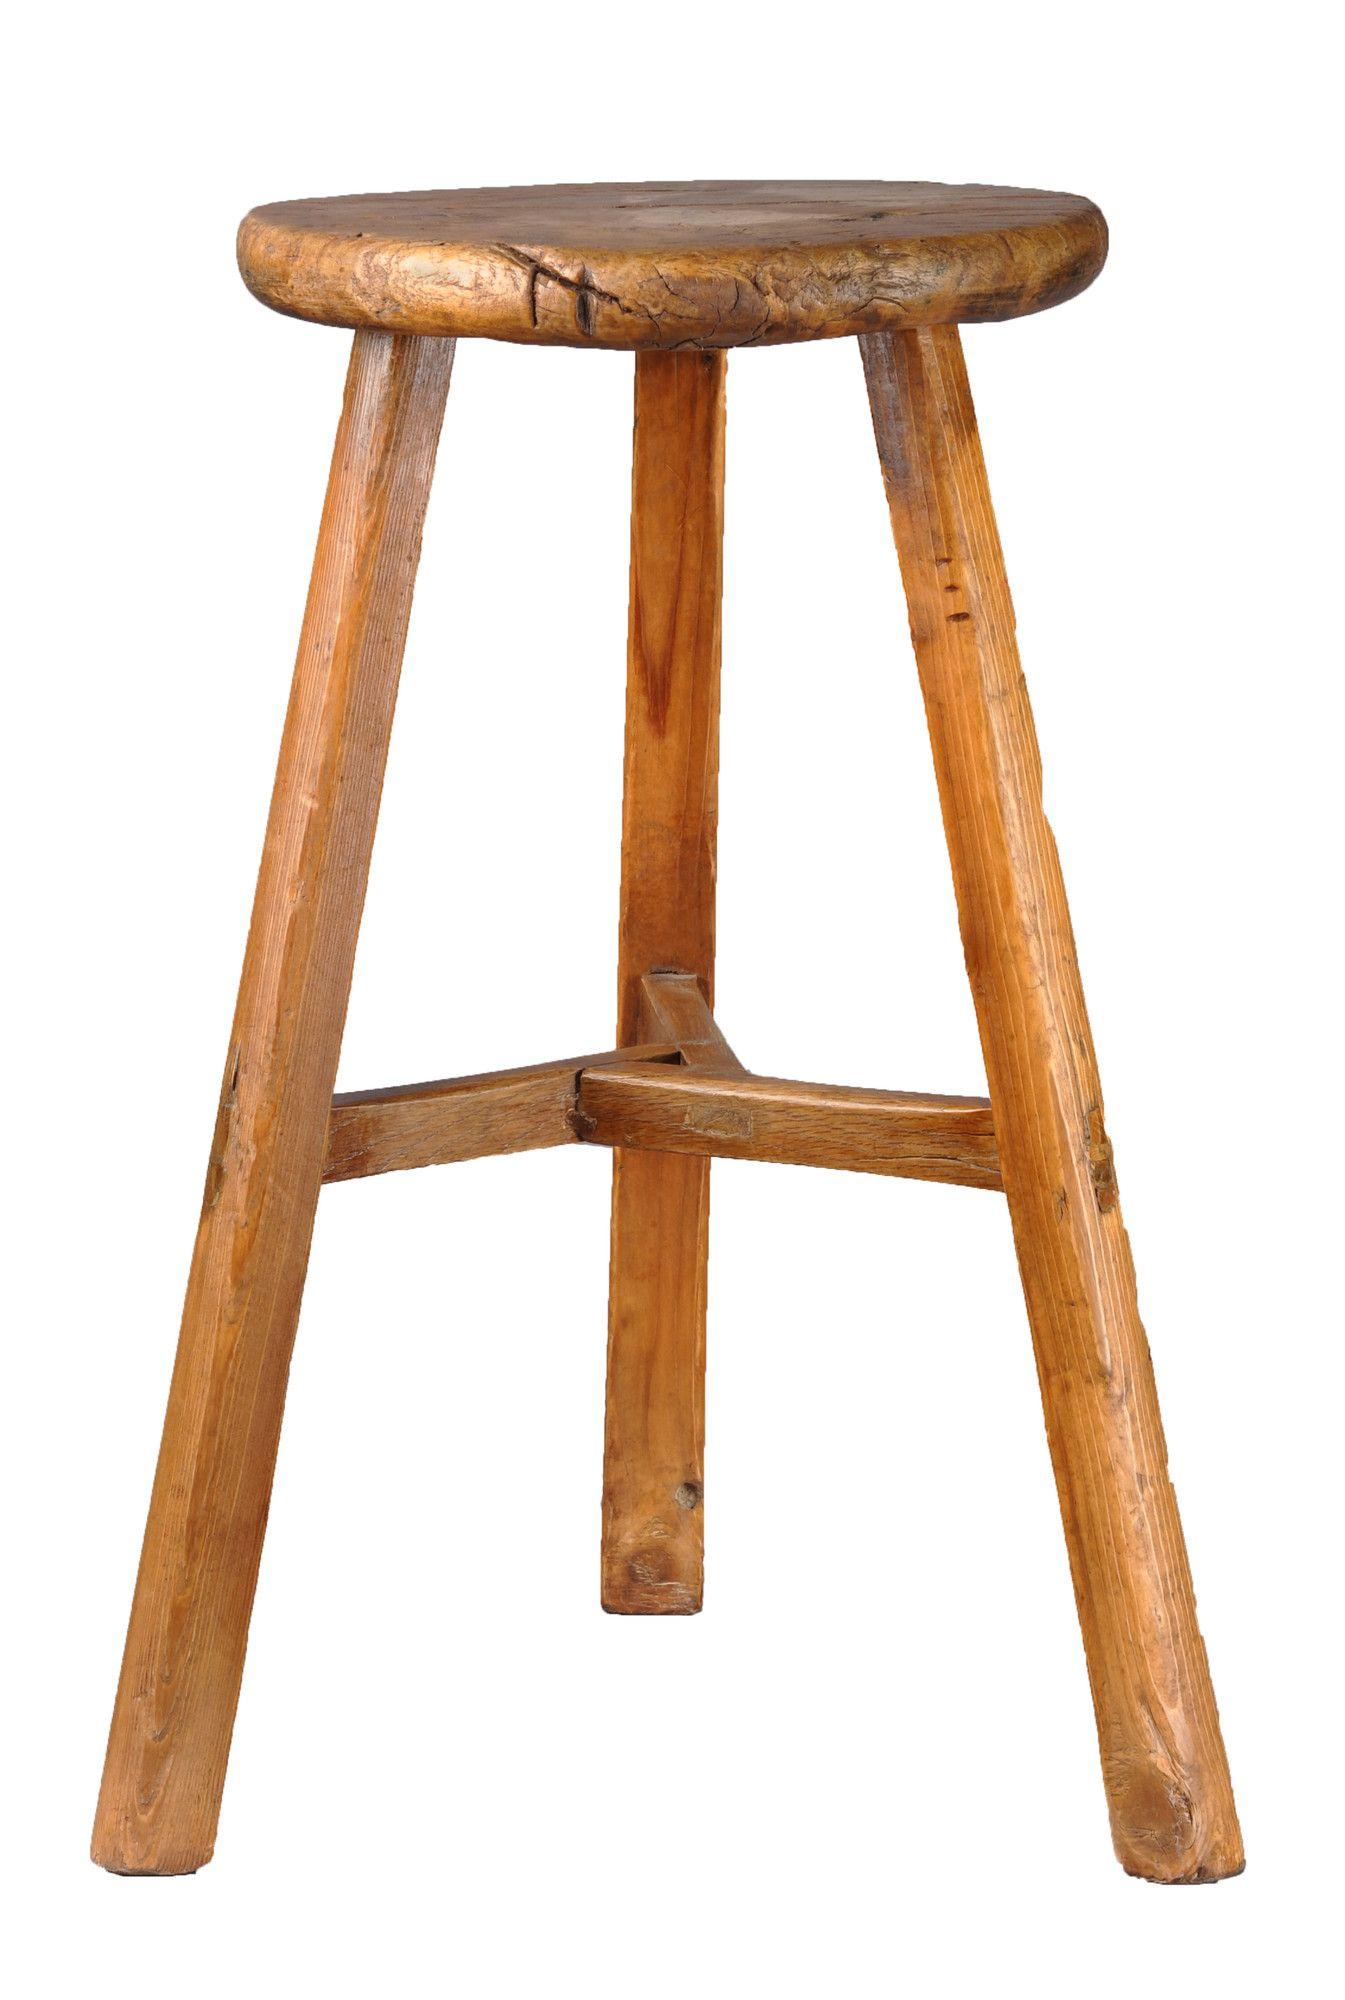 wayfair kitchen stools cabinet wholesale island besto blog